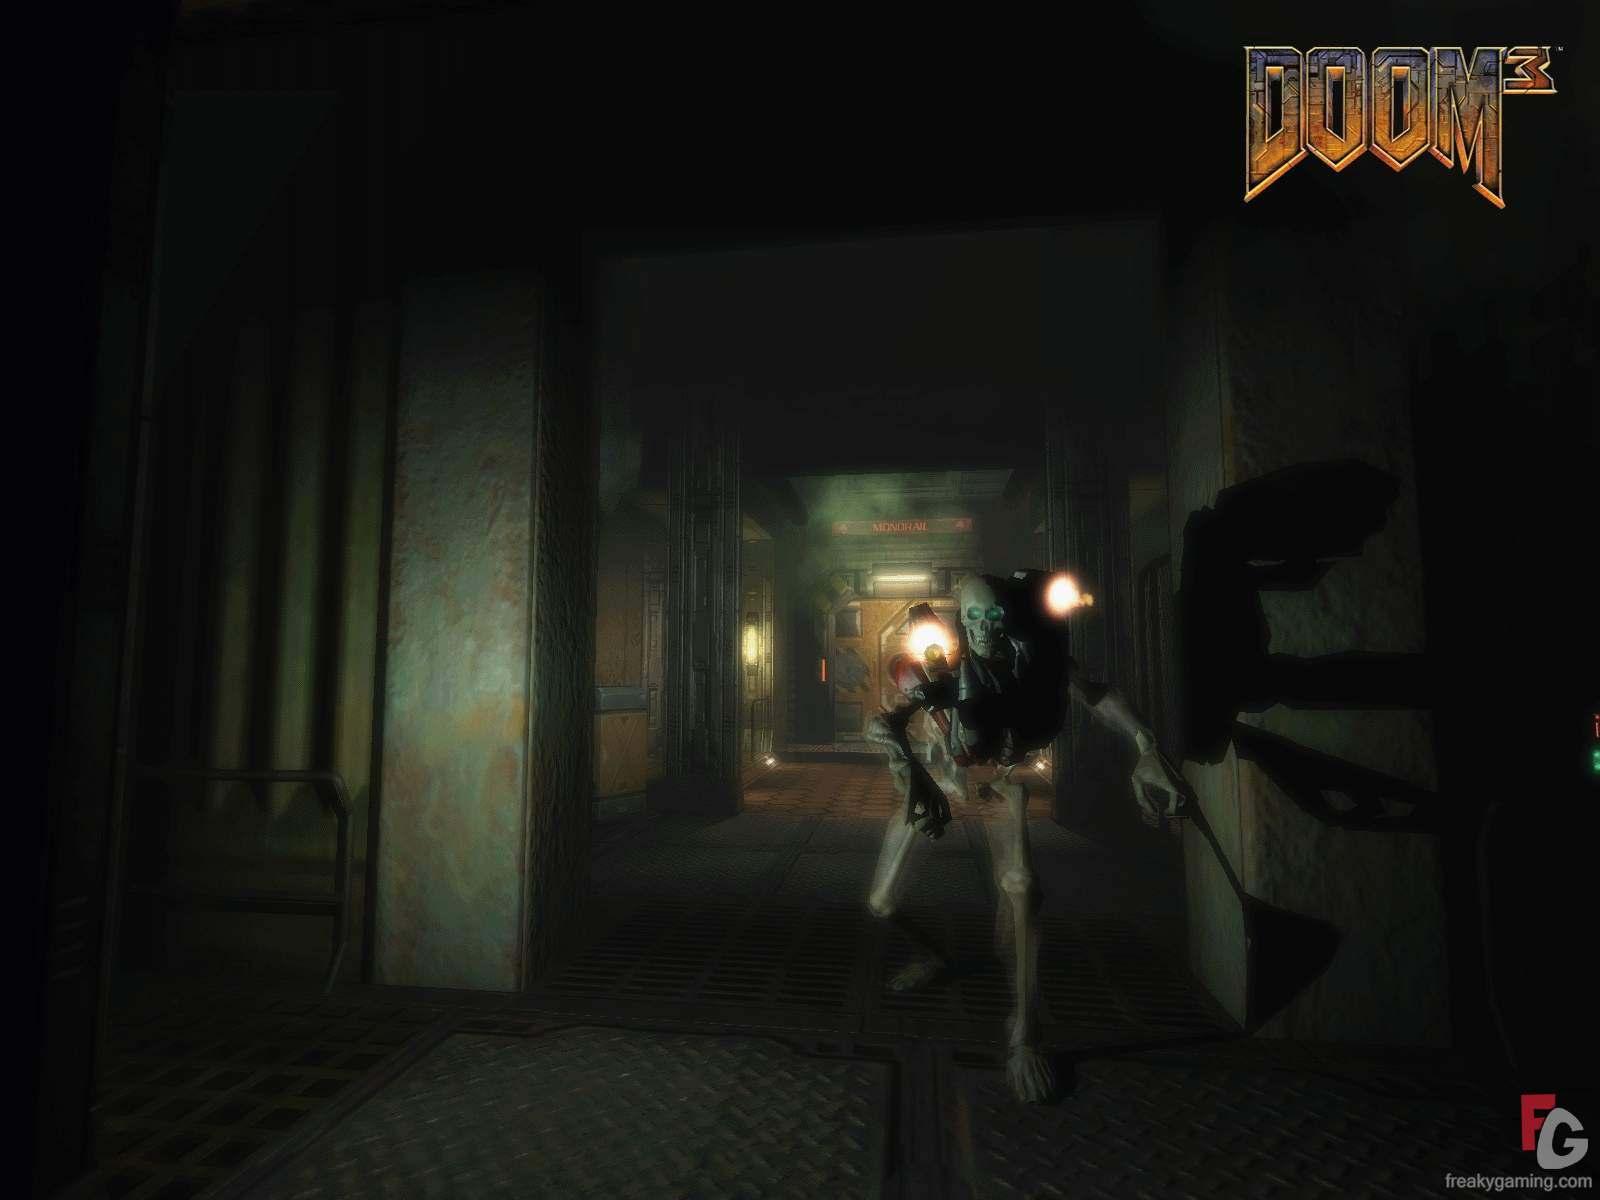 Doom 2016 Revenant Wallpapers in jpg format for free download